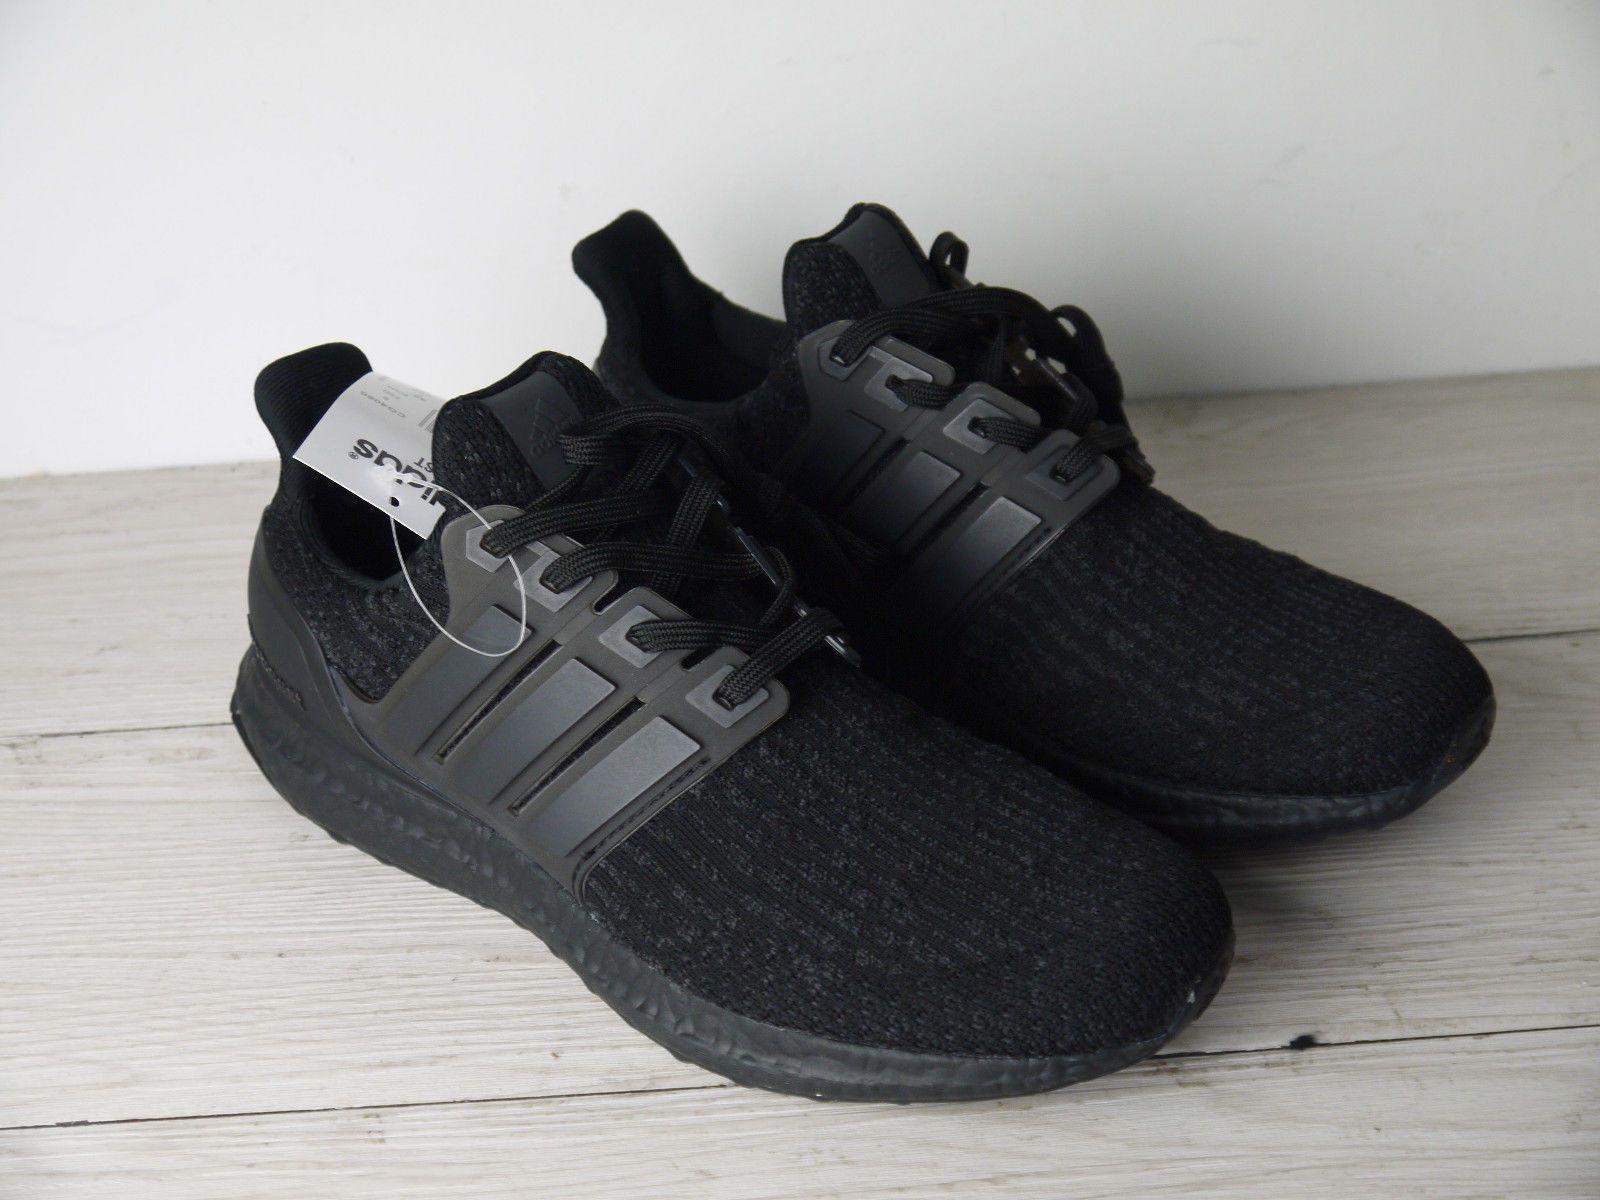 37056eda81746 ... 115.15 usd mens footwear adidas ultra boost 3.0 triple black ba8920  2017 size